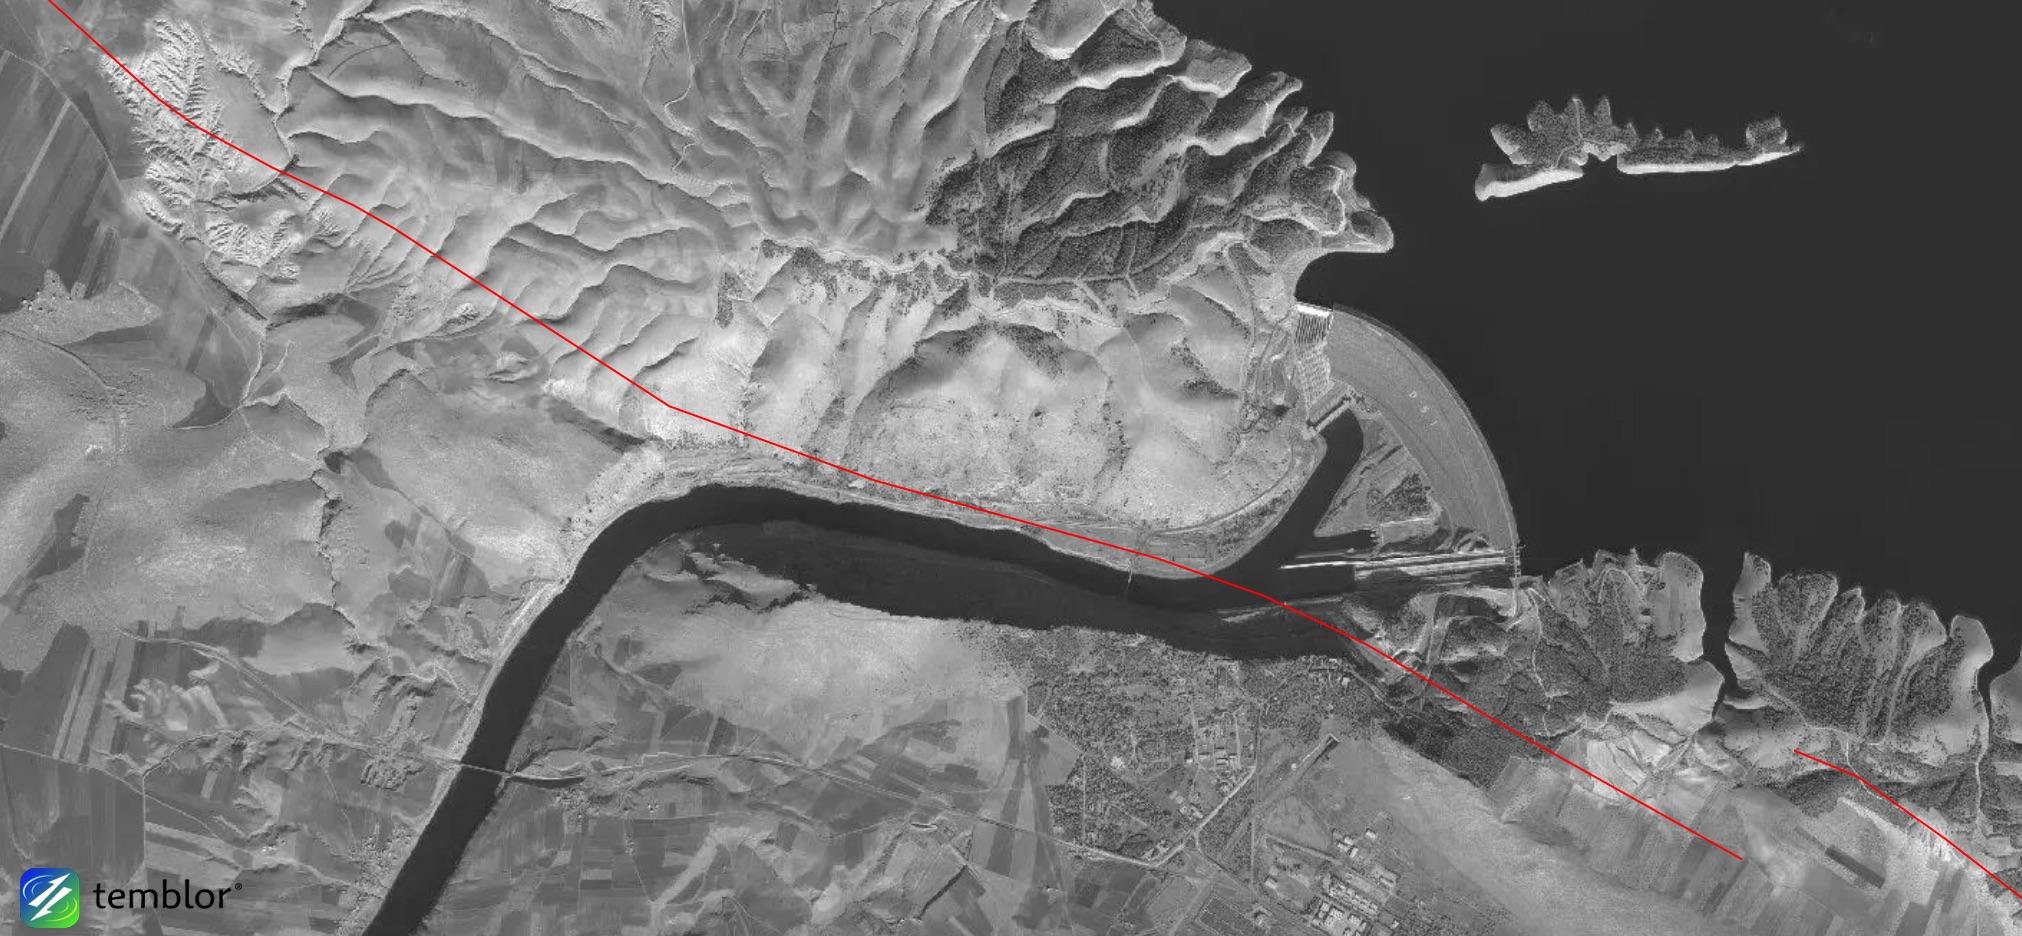 http://static.temblor.net/wp-content/uploads/2018/04/Ataturk-dam-fault.jpg